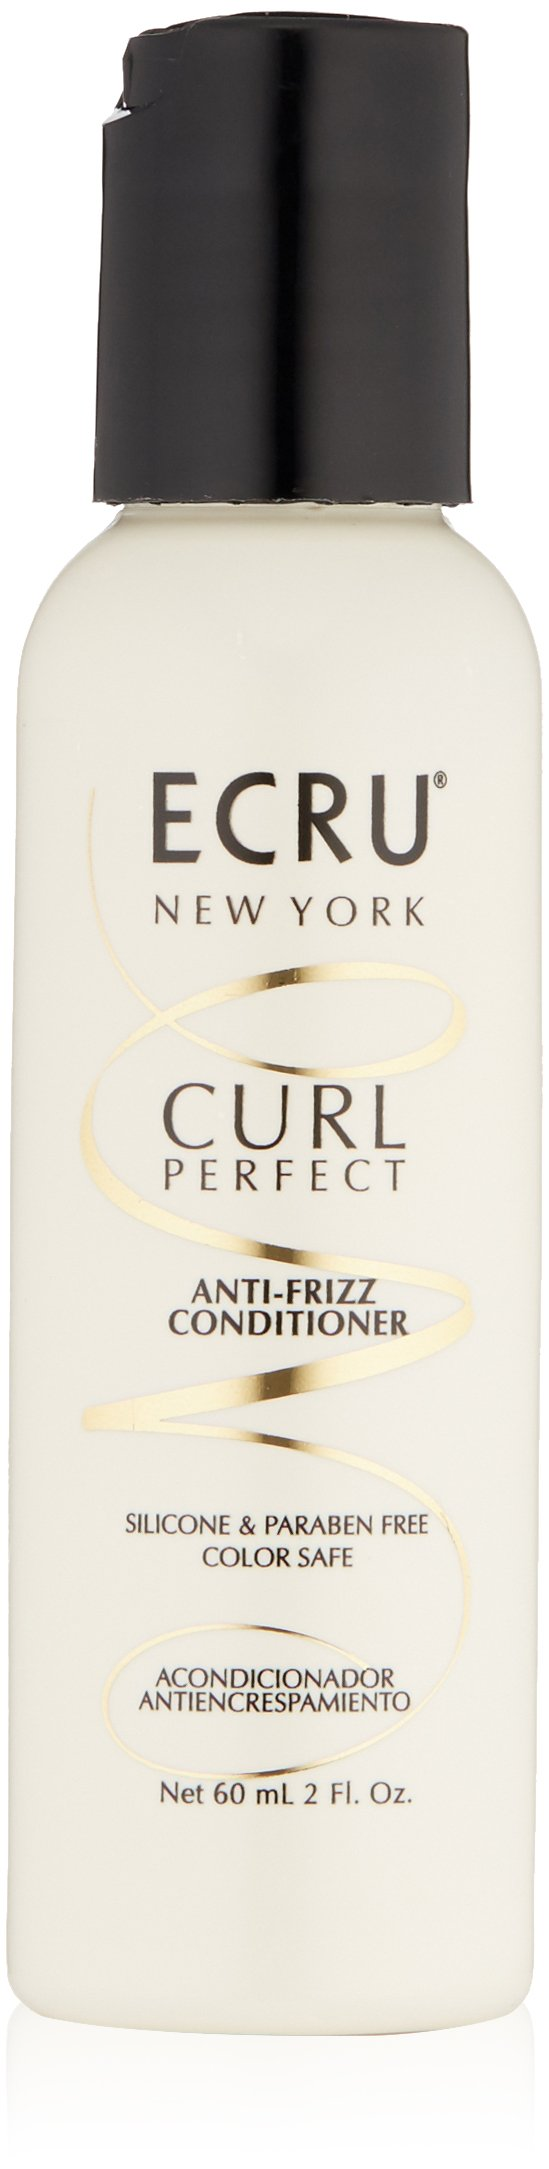 Ecru New York Curl Perfect Anti-Frizz Conditioner